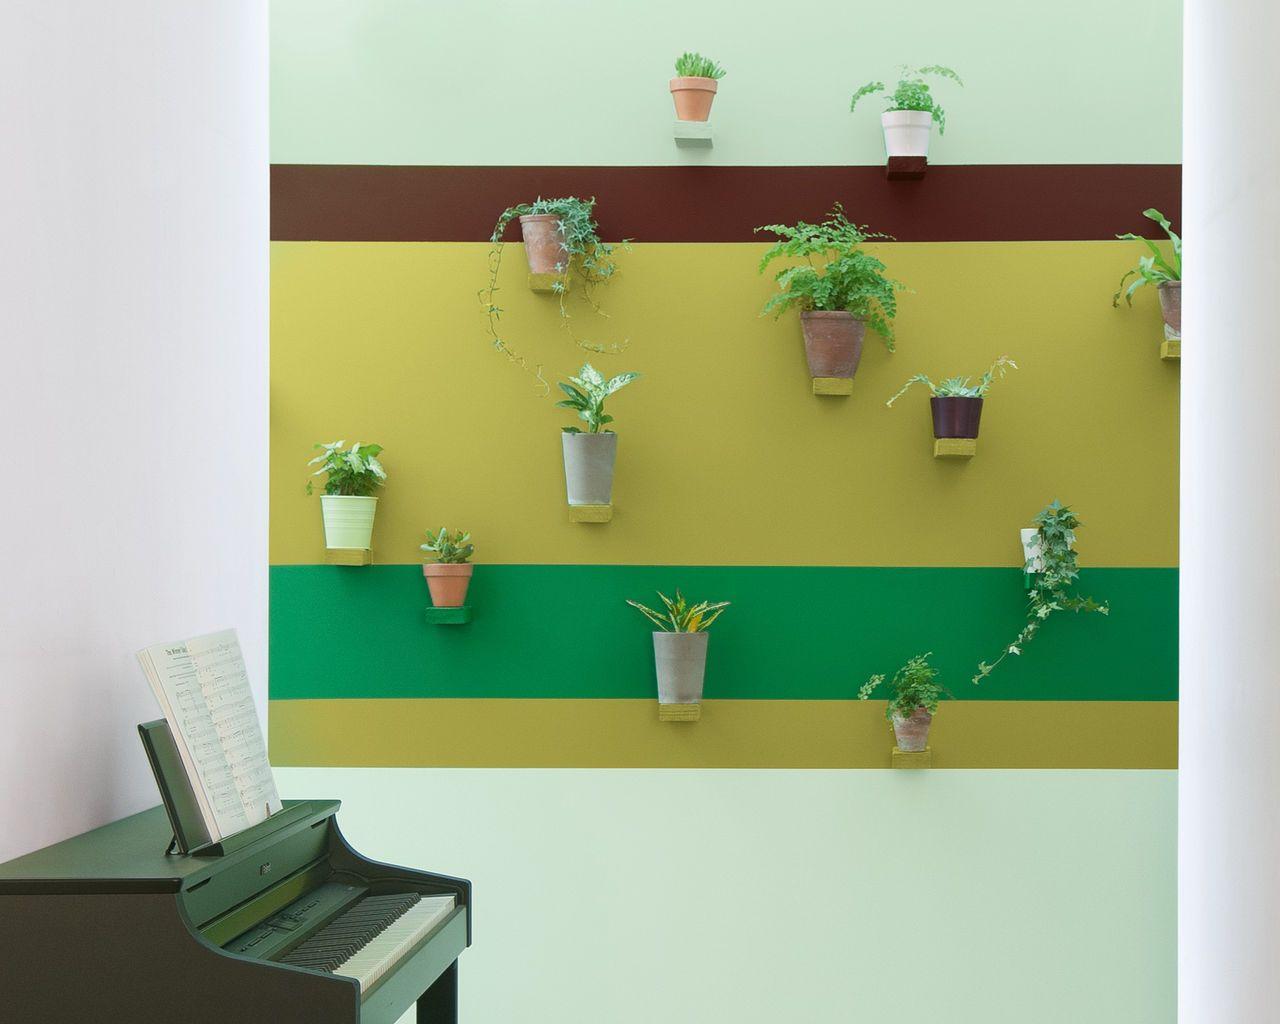 Deco plante - Dulux Valentine